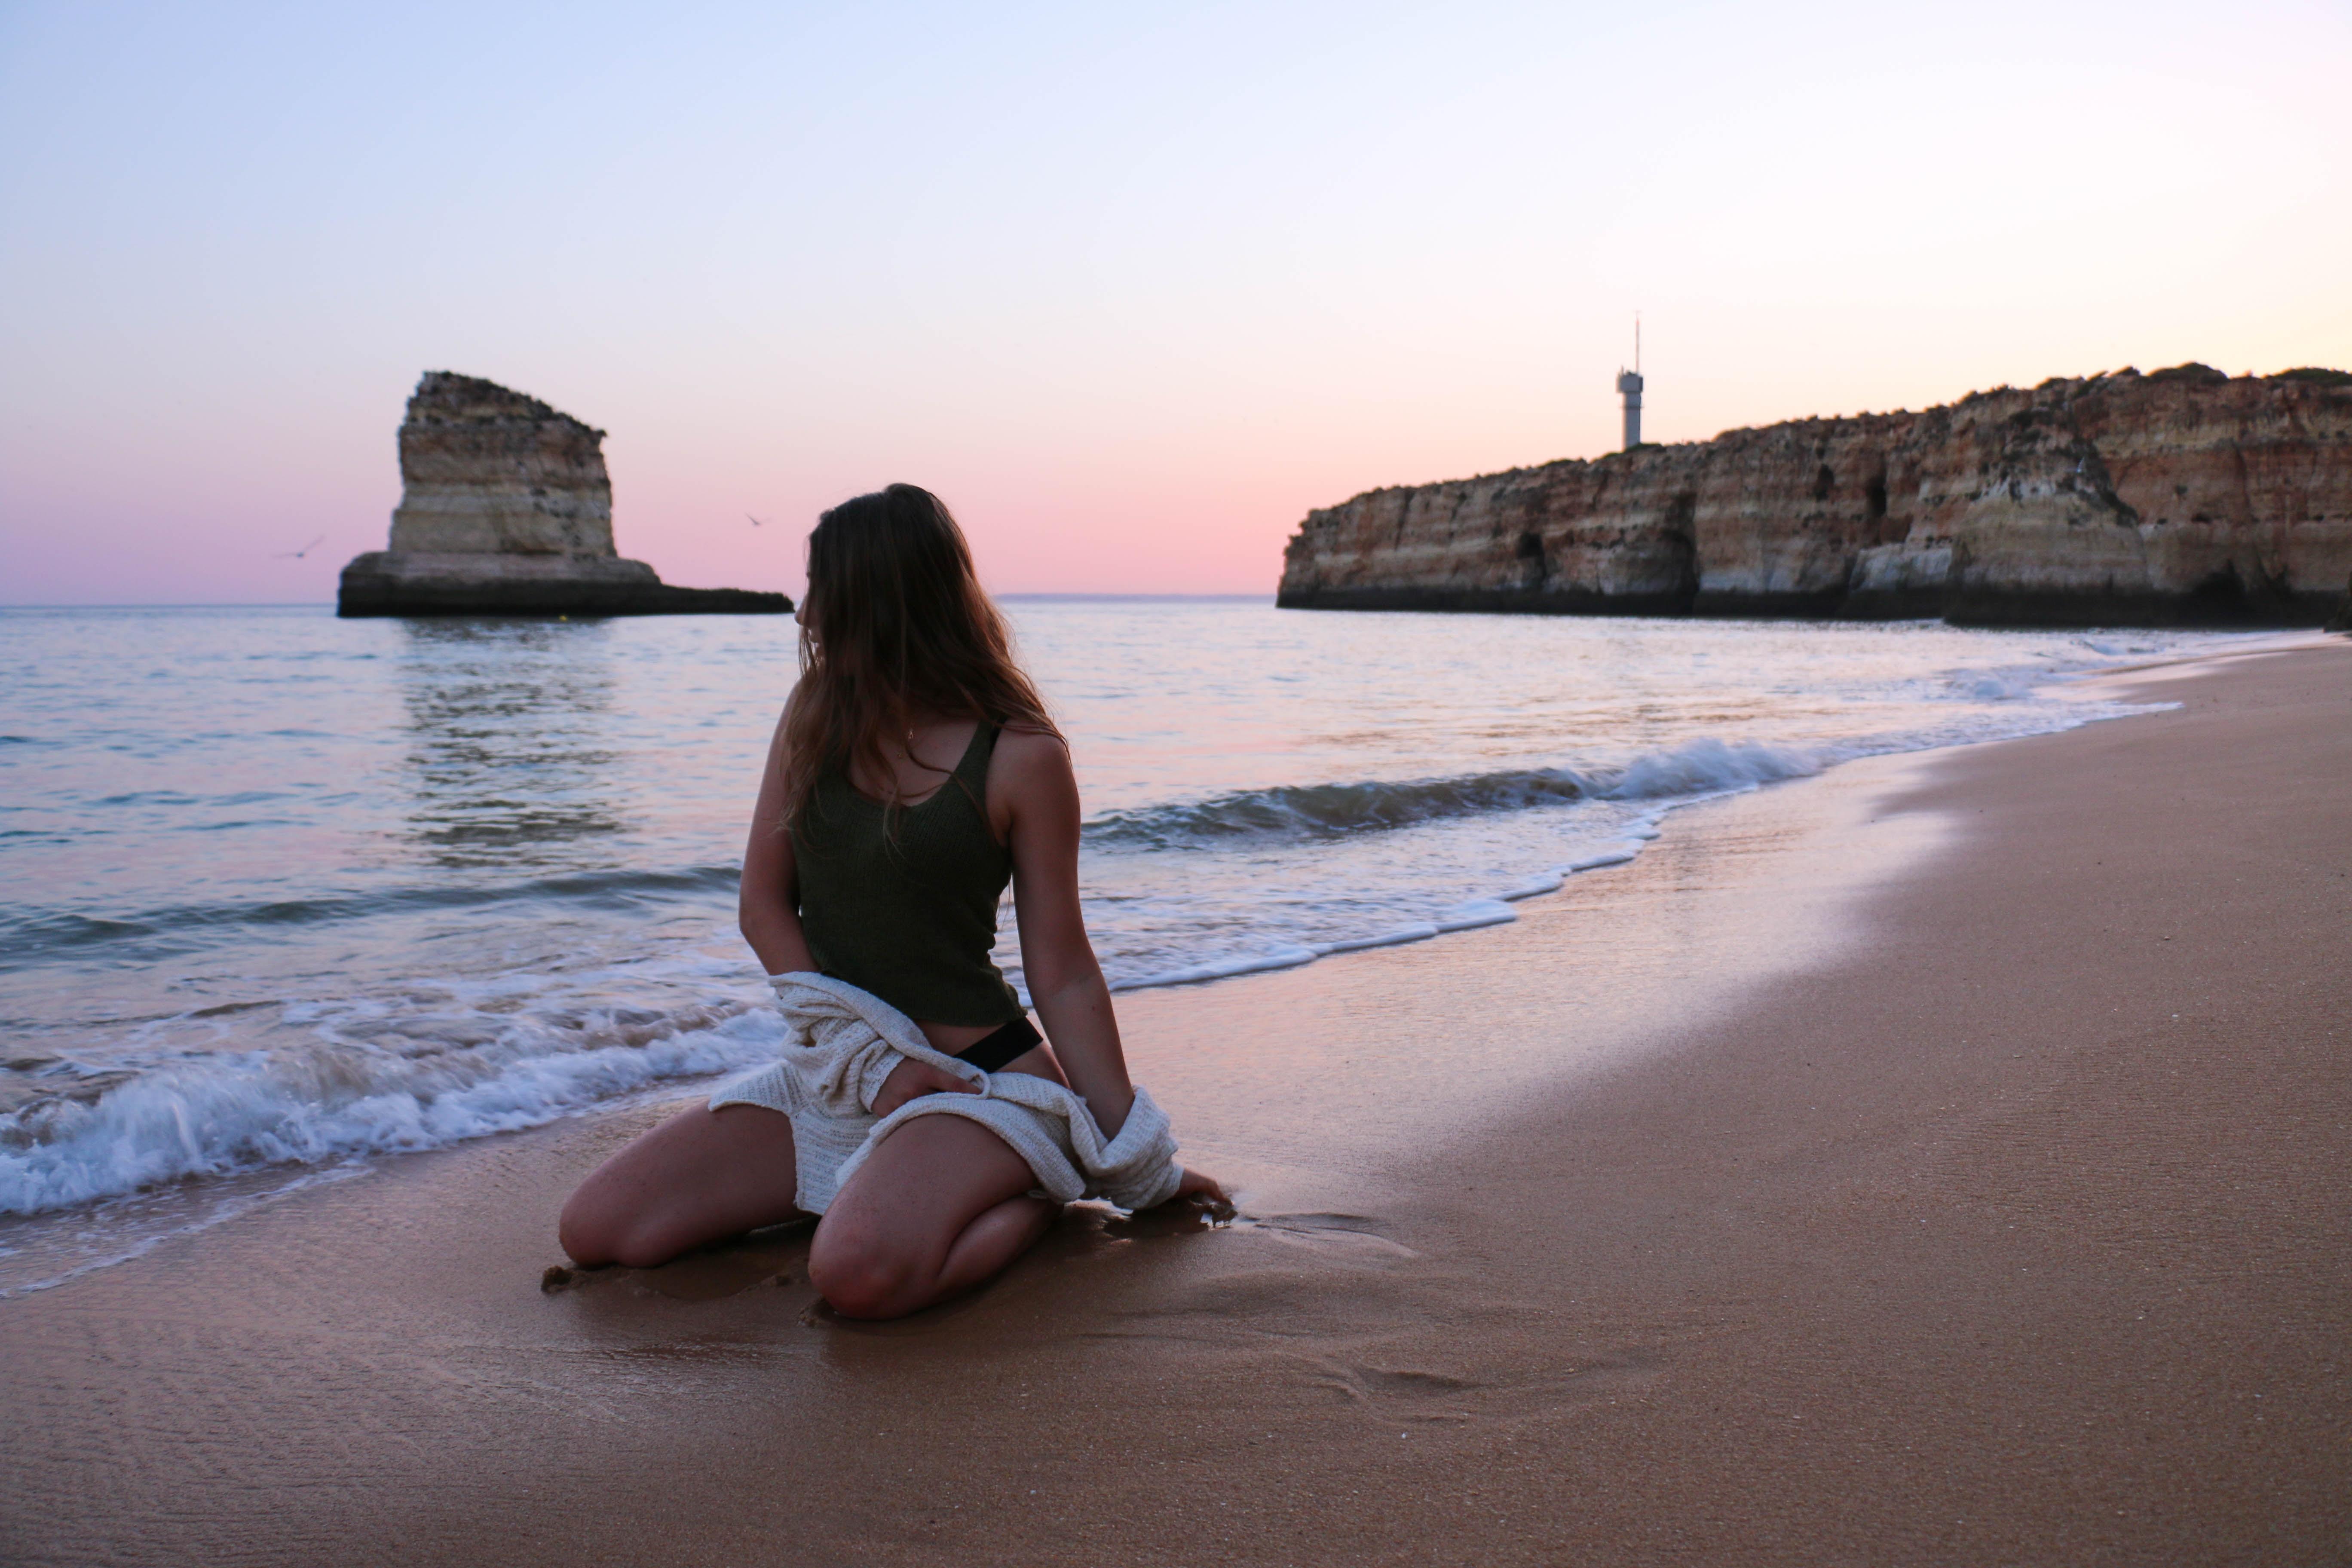 woman wearing black tank top sitting on gray sand near beach